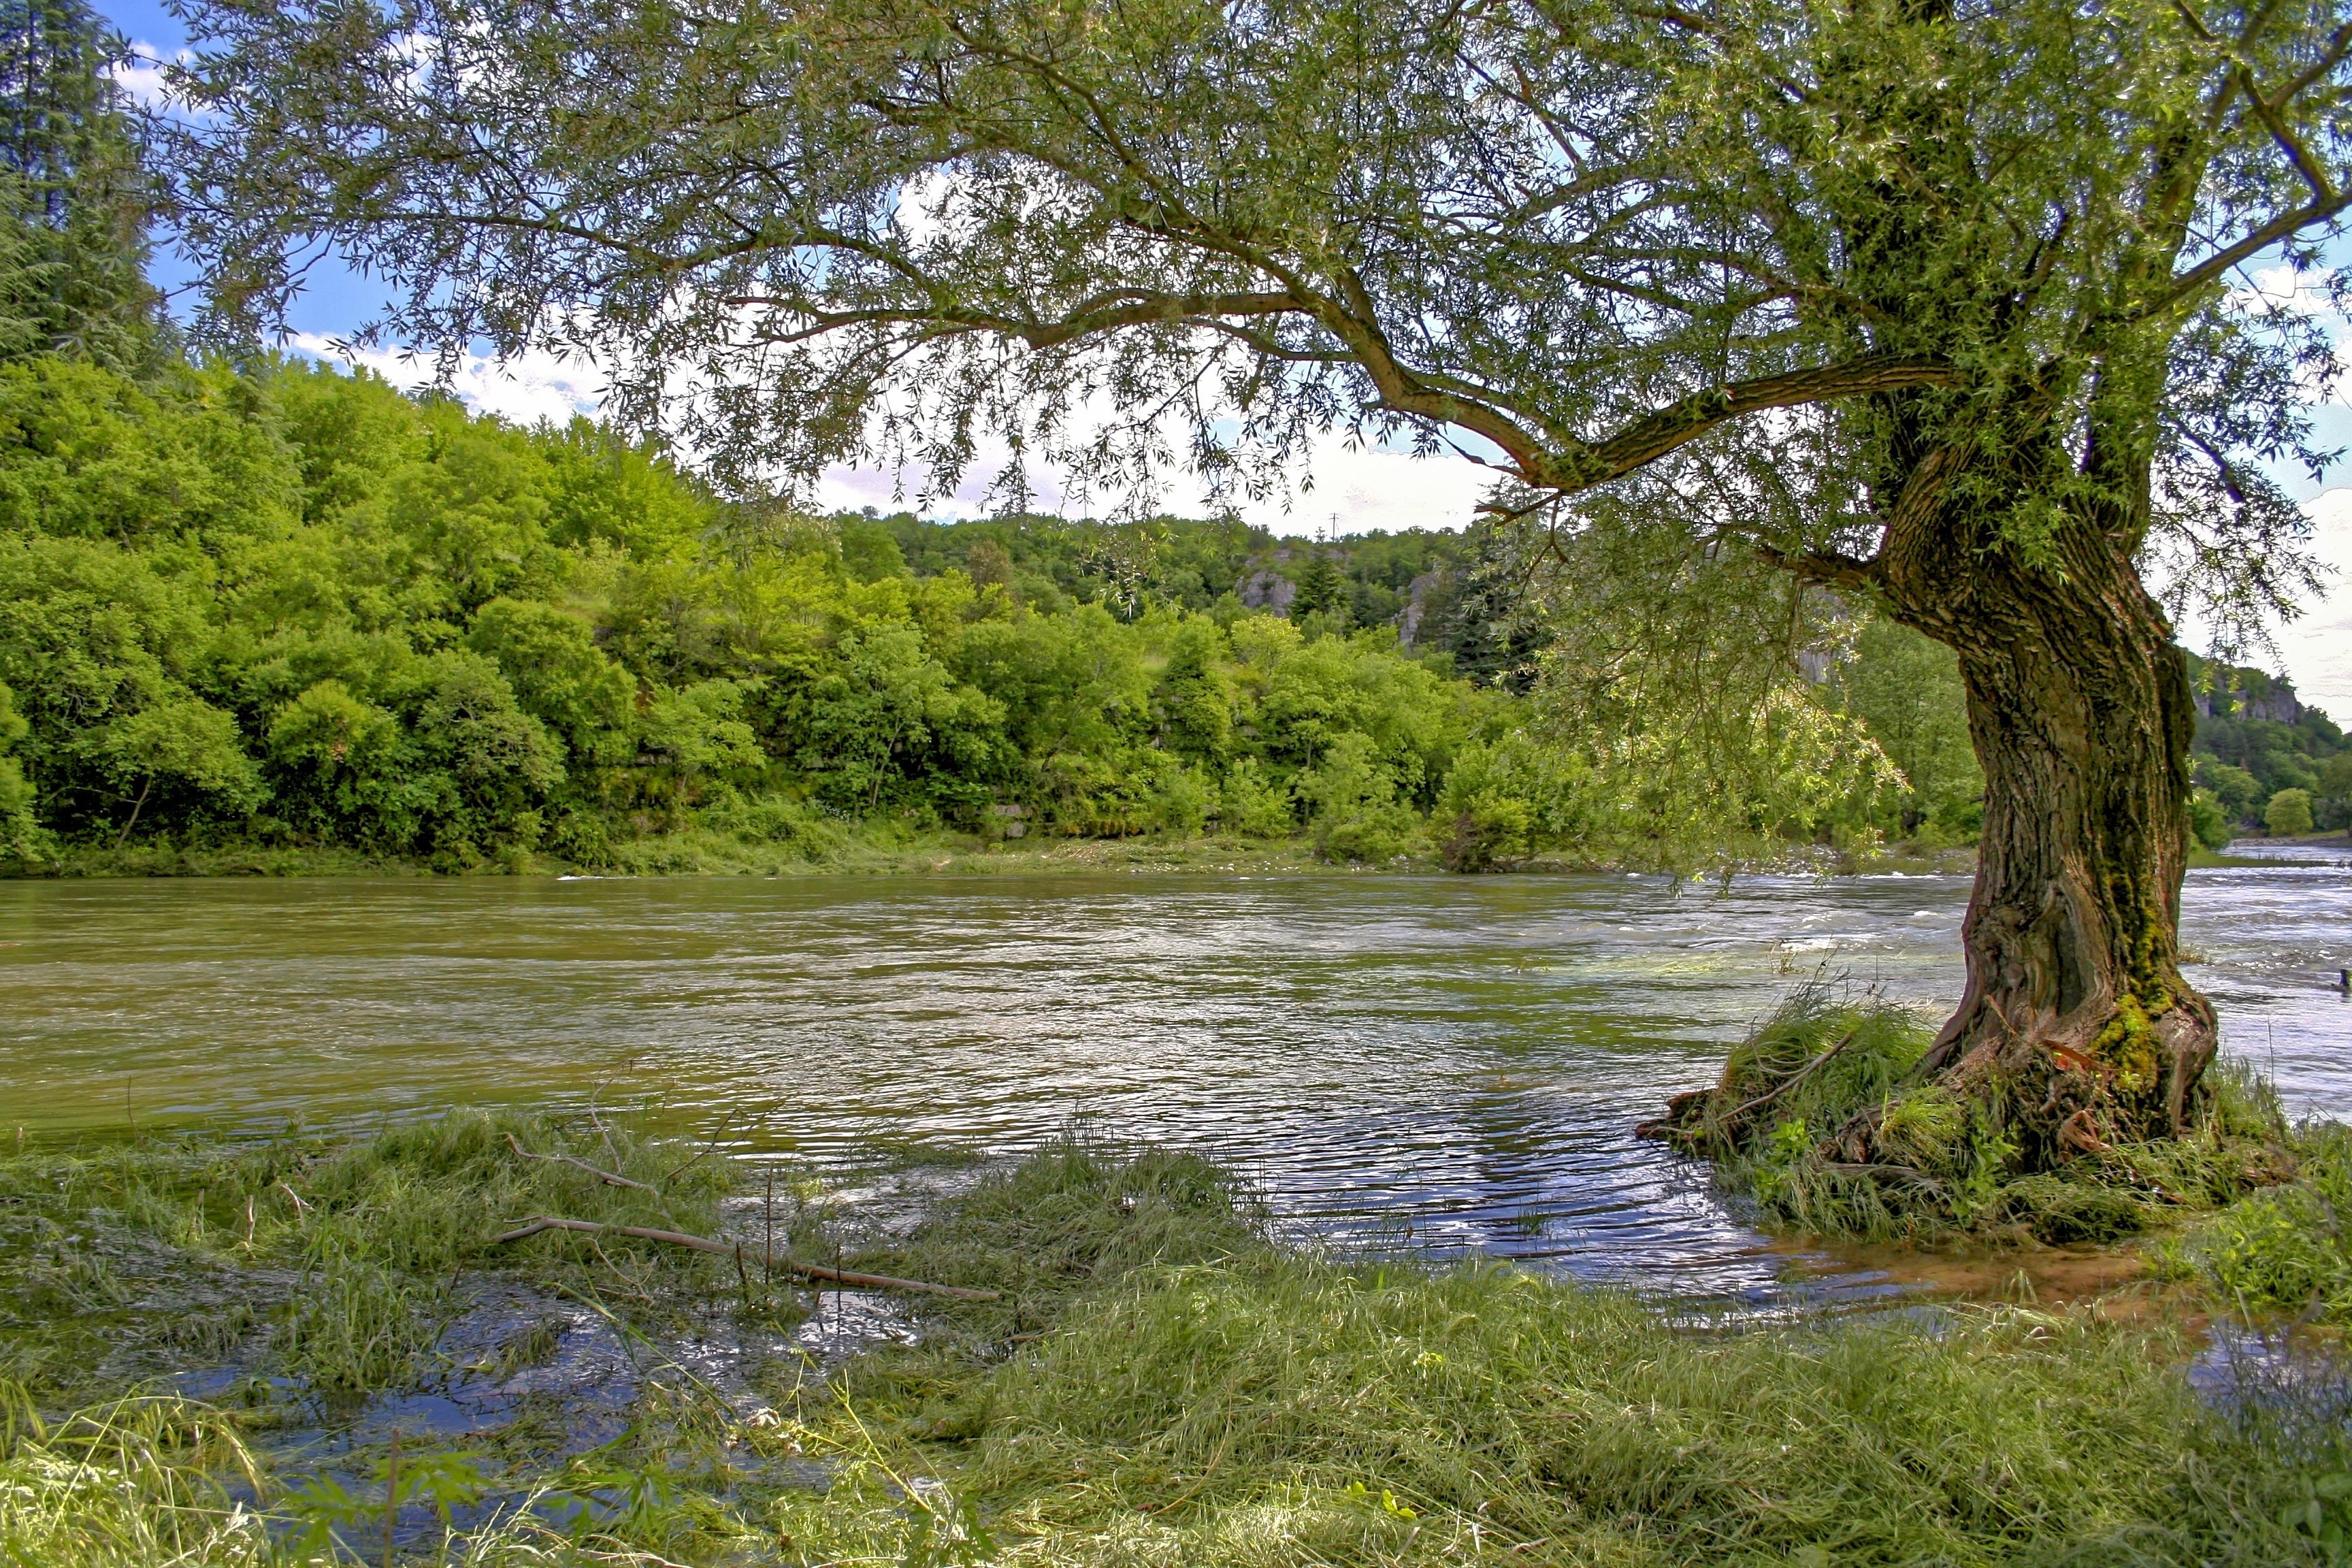 Gambar Pemandangan Alam Sungai Kecil Gurun Danau Musim Panas